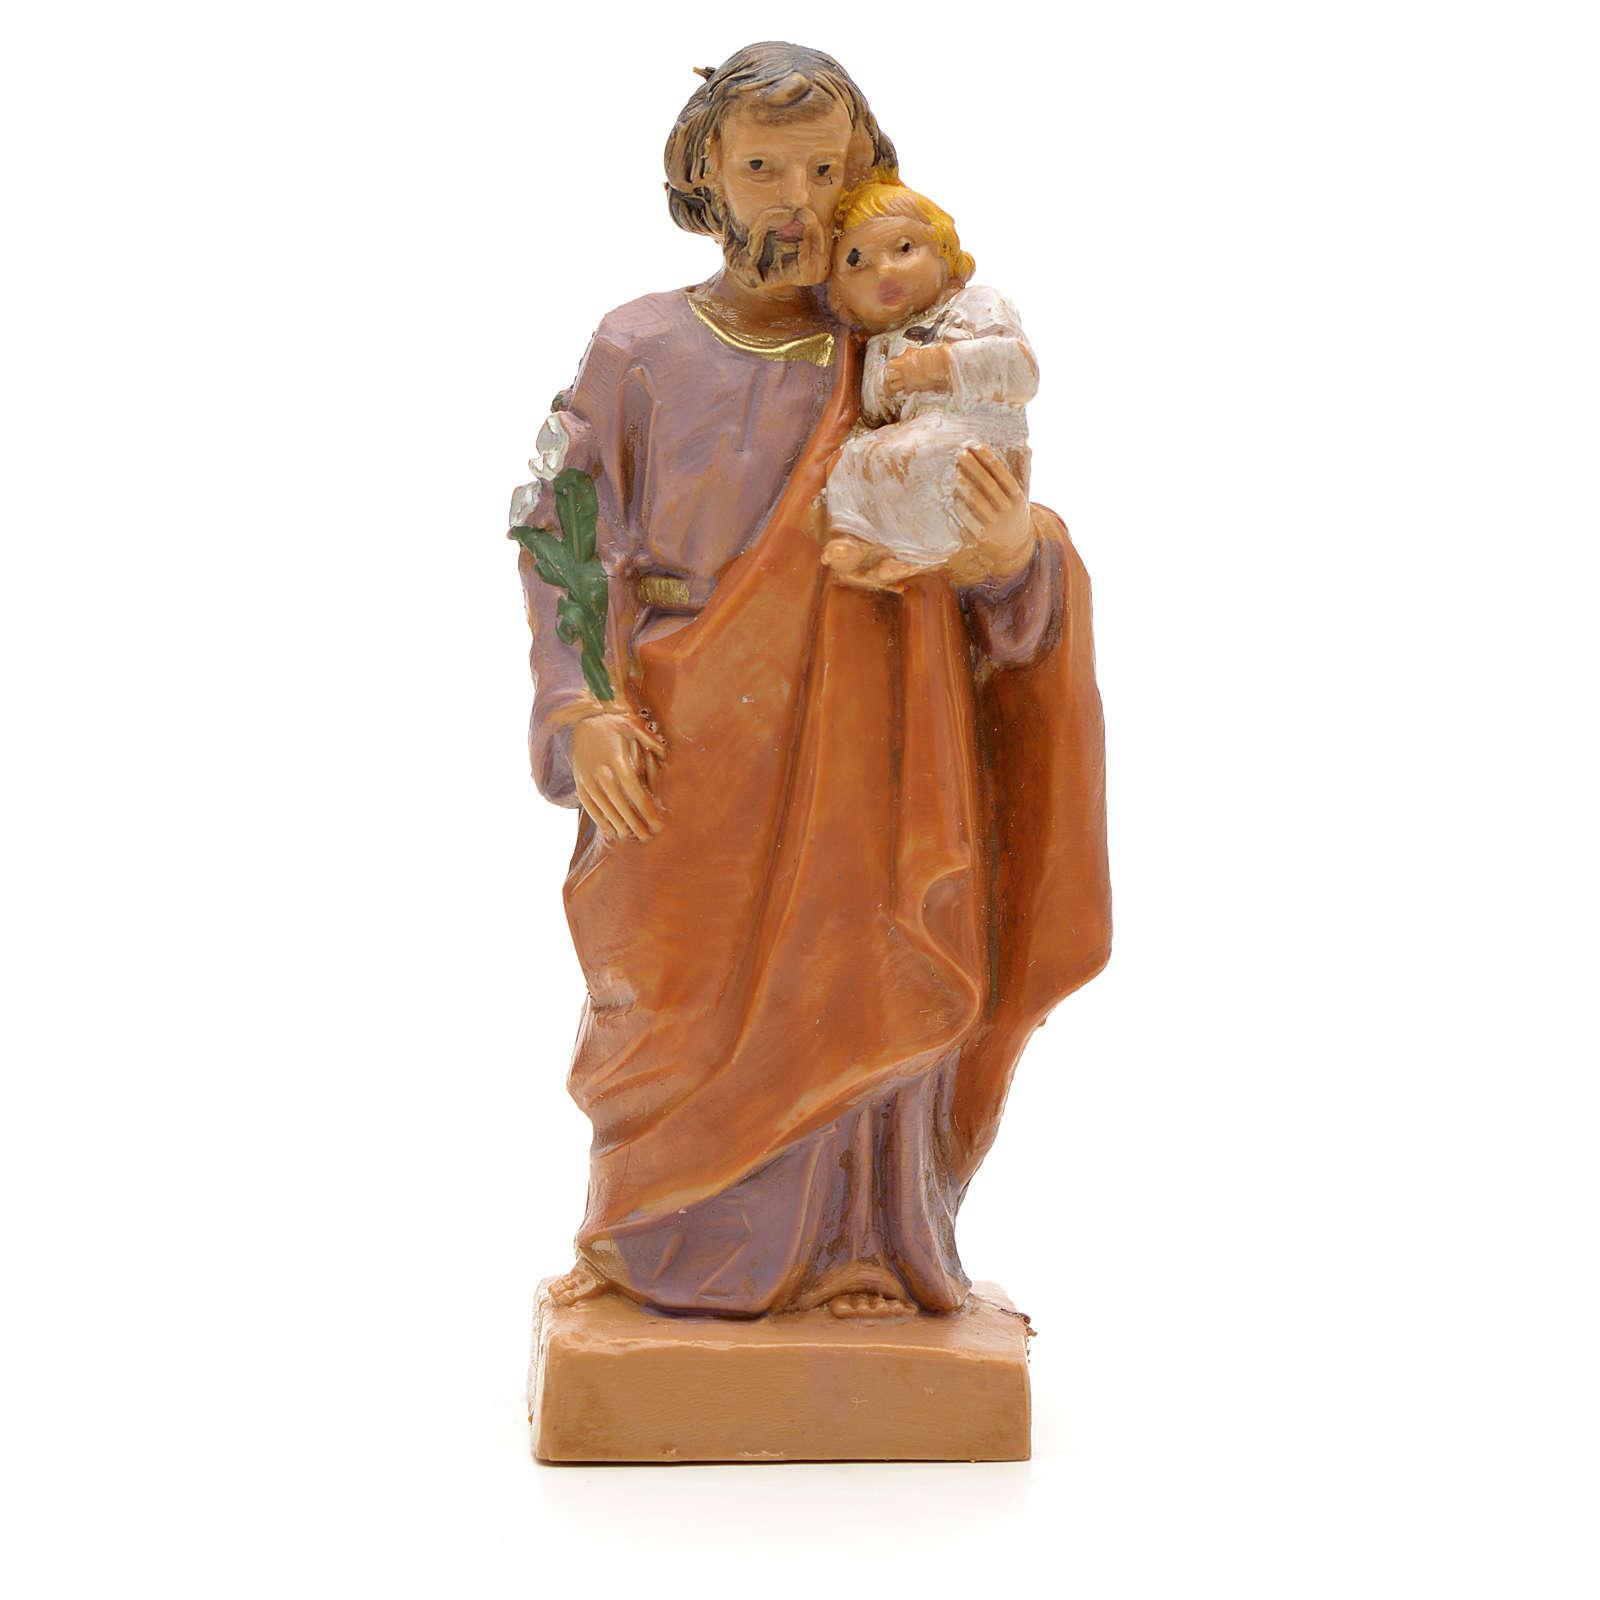 Josef mit Kind 7cm, Fontanini 4